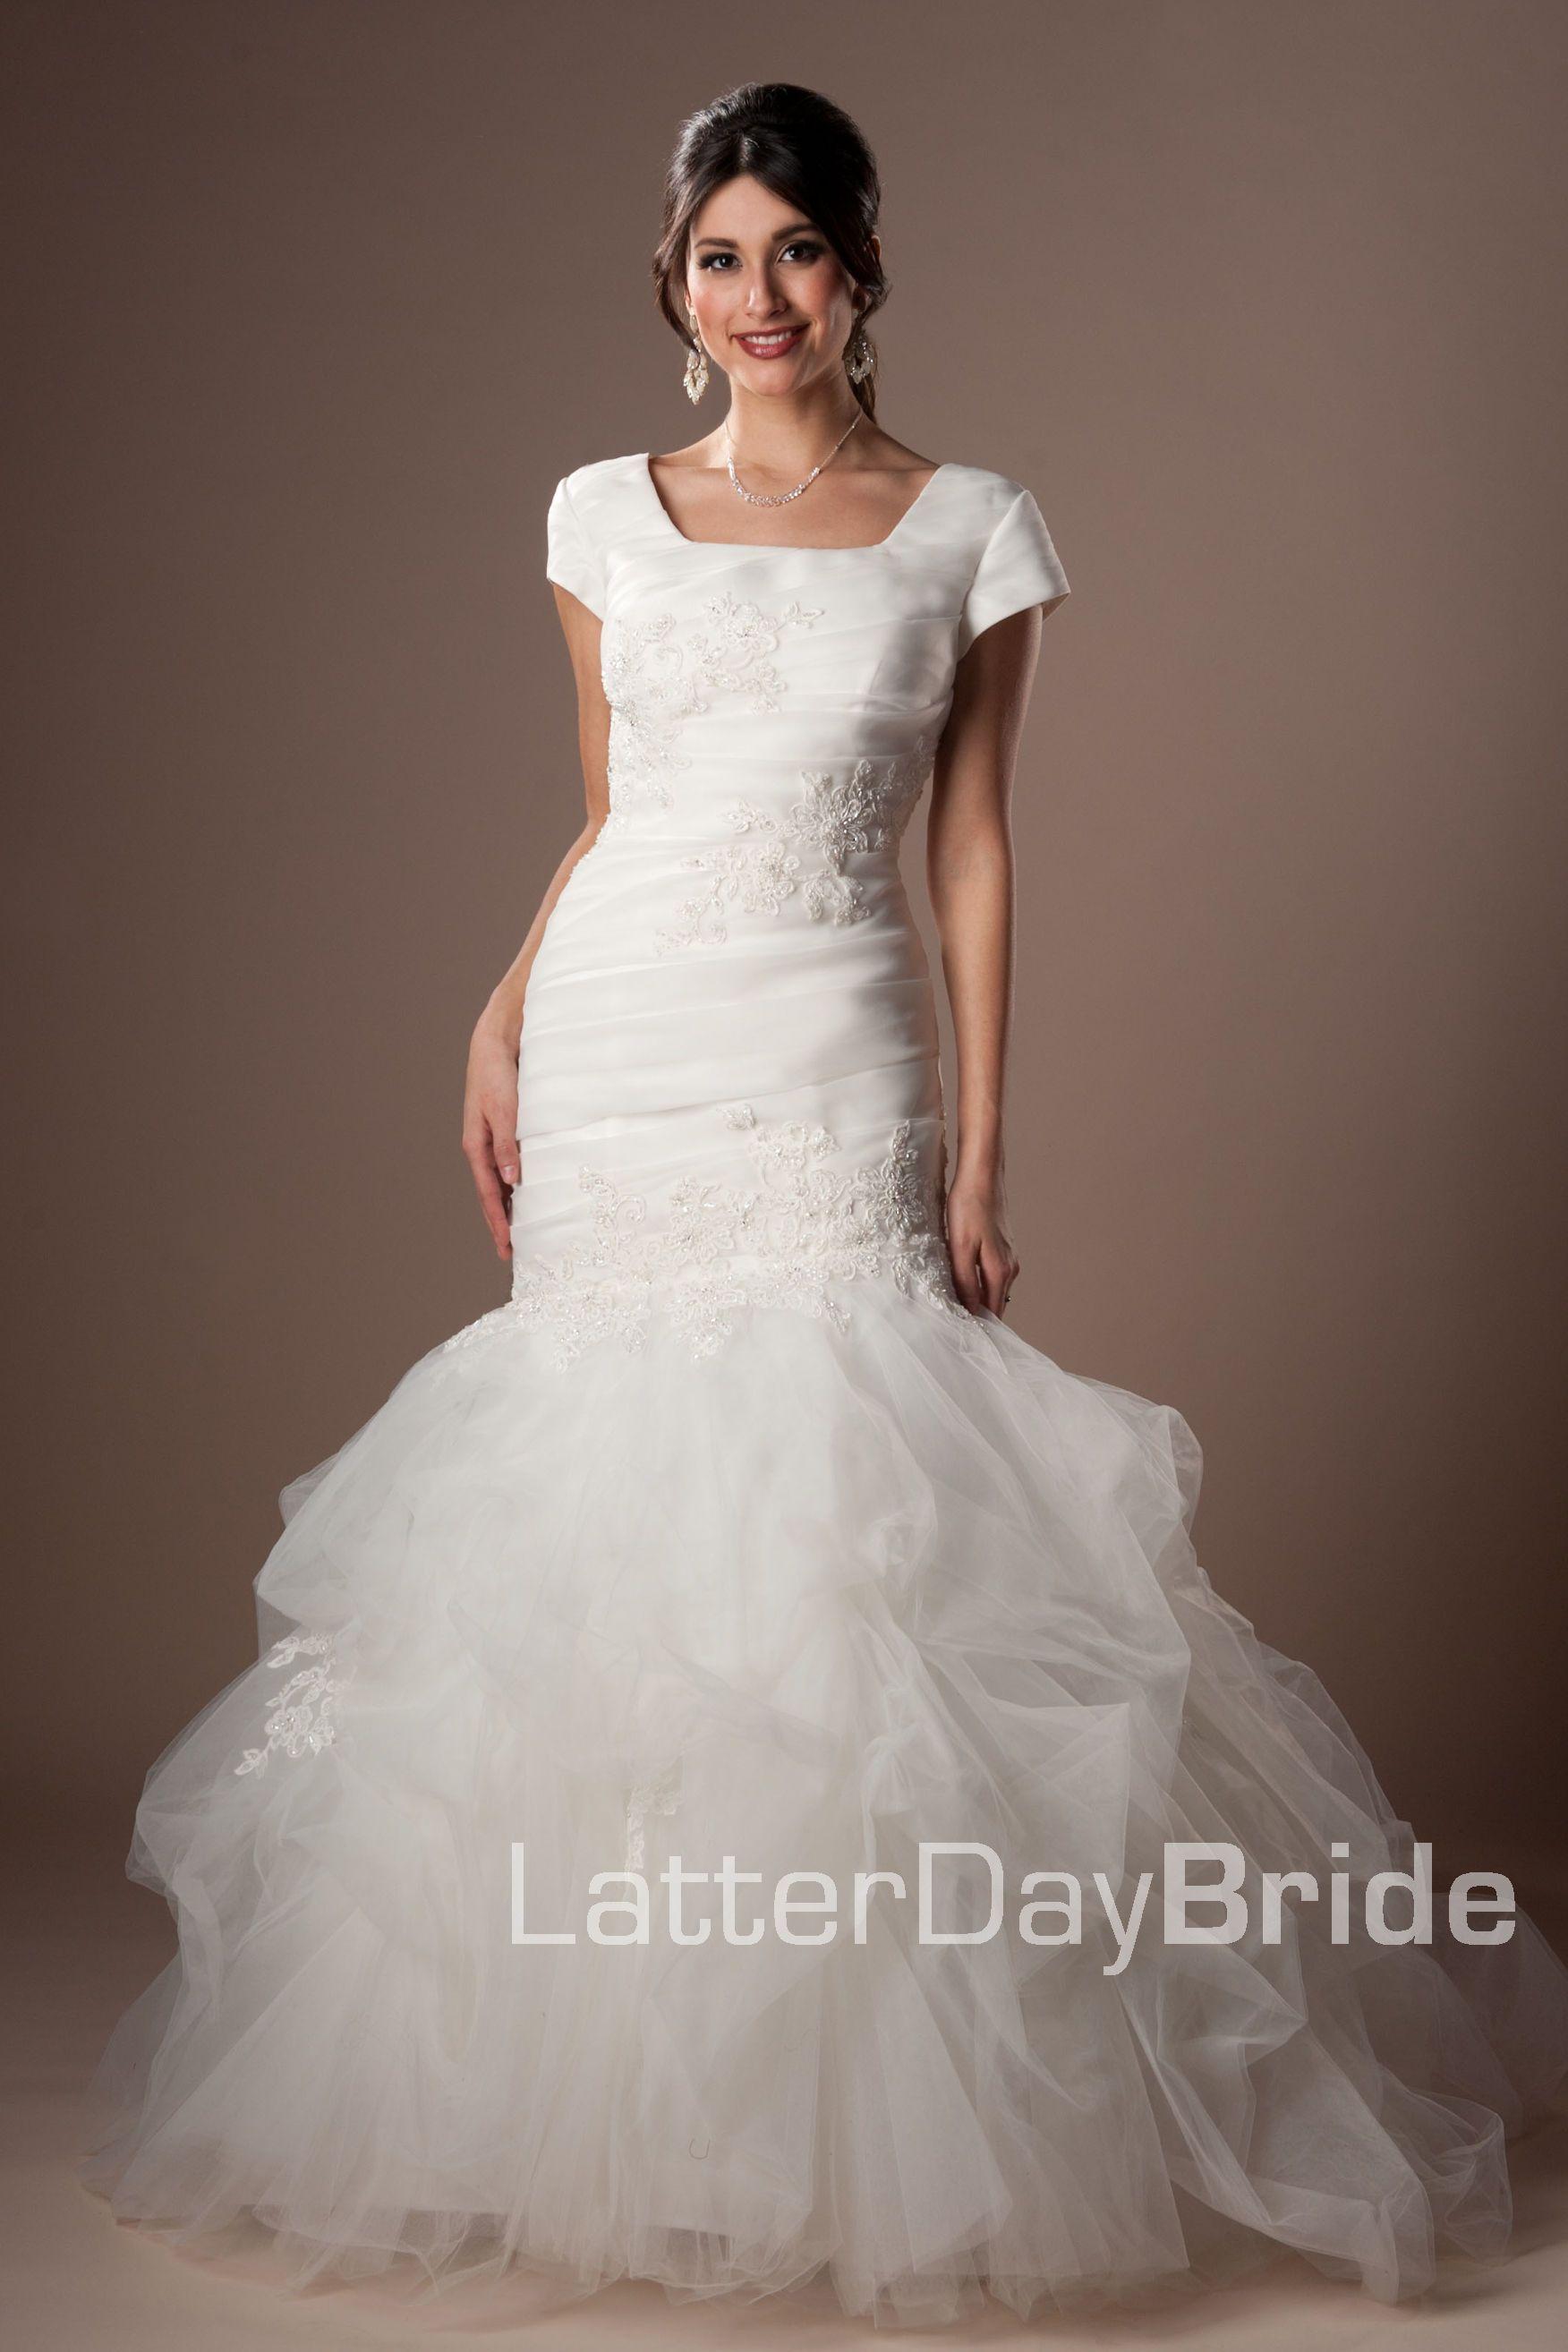 So Pretty Womens Wedding Dresses Modest Bridal Gowns Modest Wedding Dresses With Sleeves [ 2628 x 1752 Pixel ]